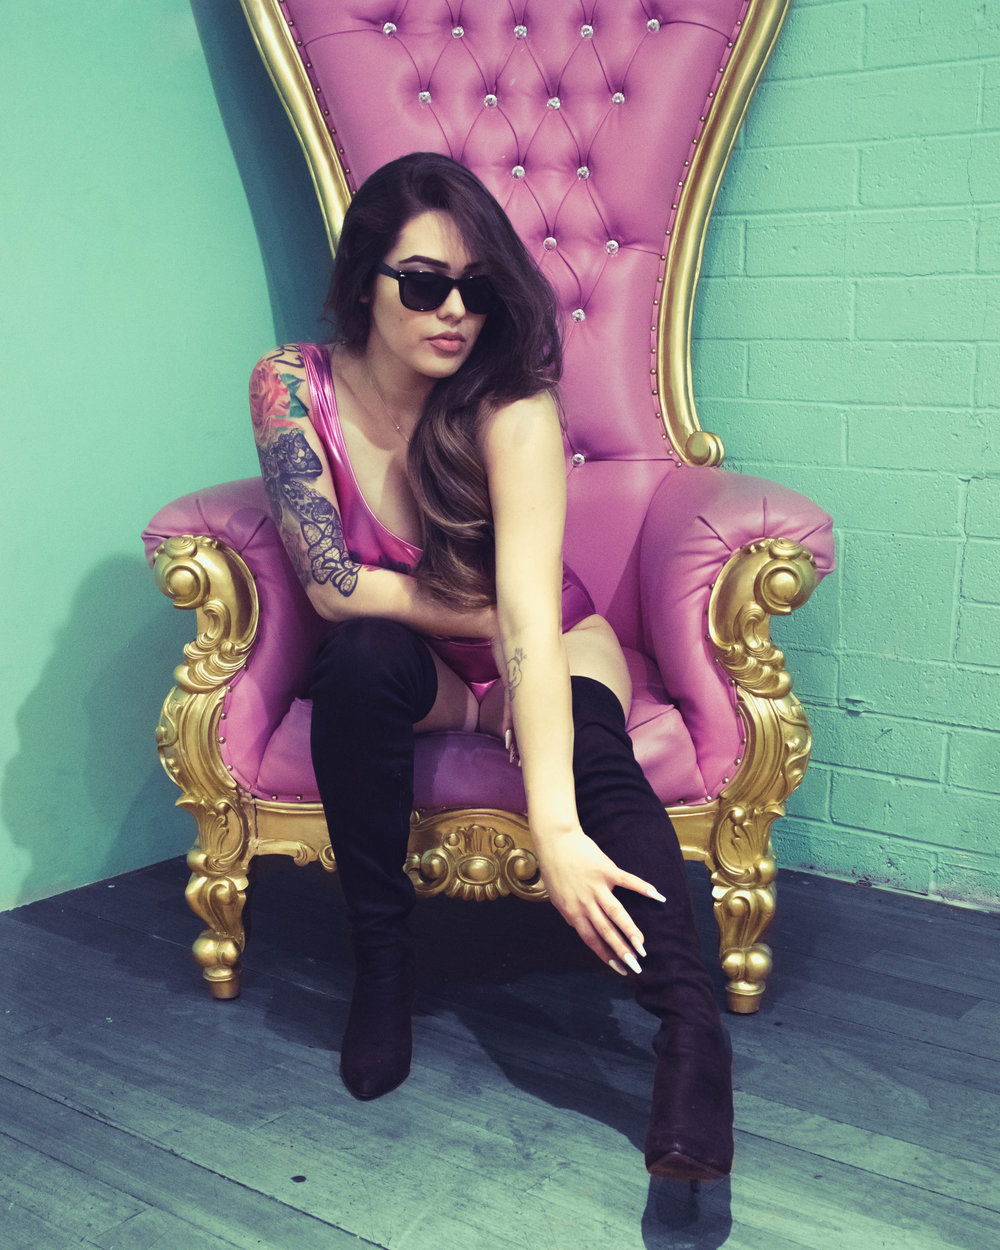 AXC Art of Ice Cream/spanish barbie chair